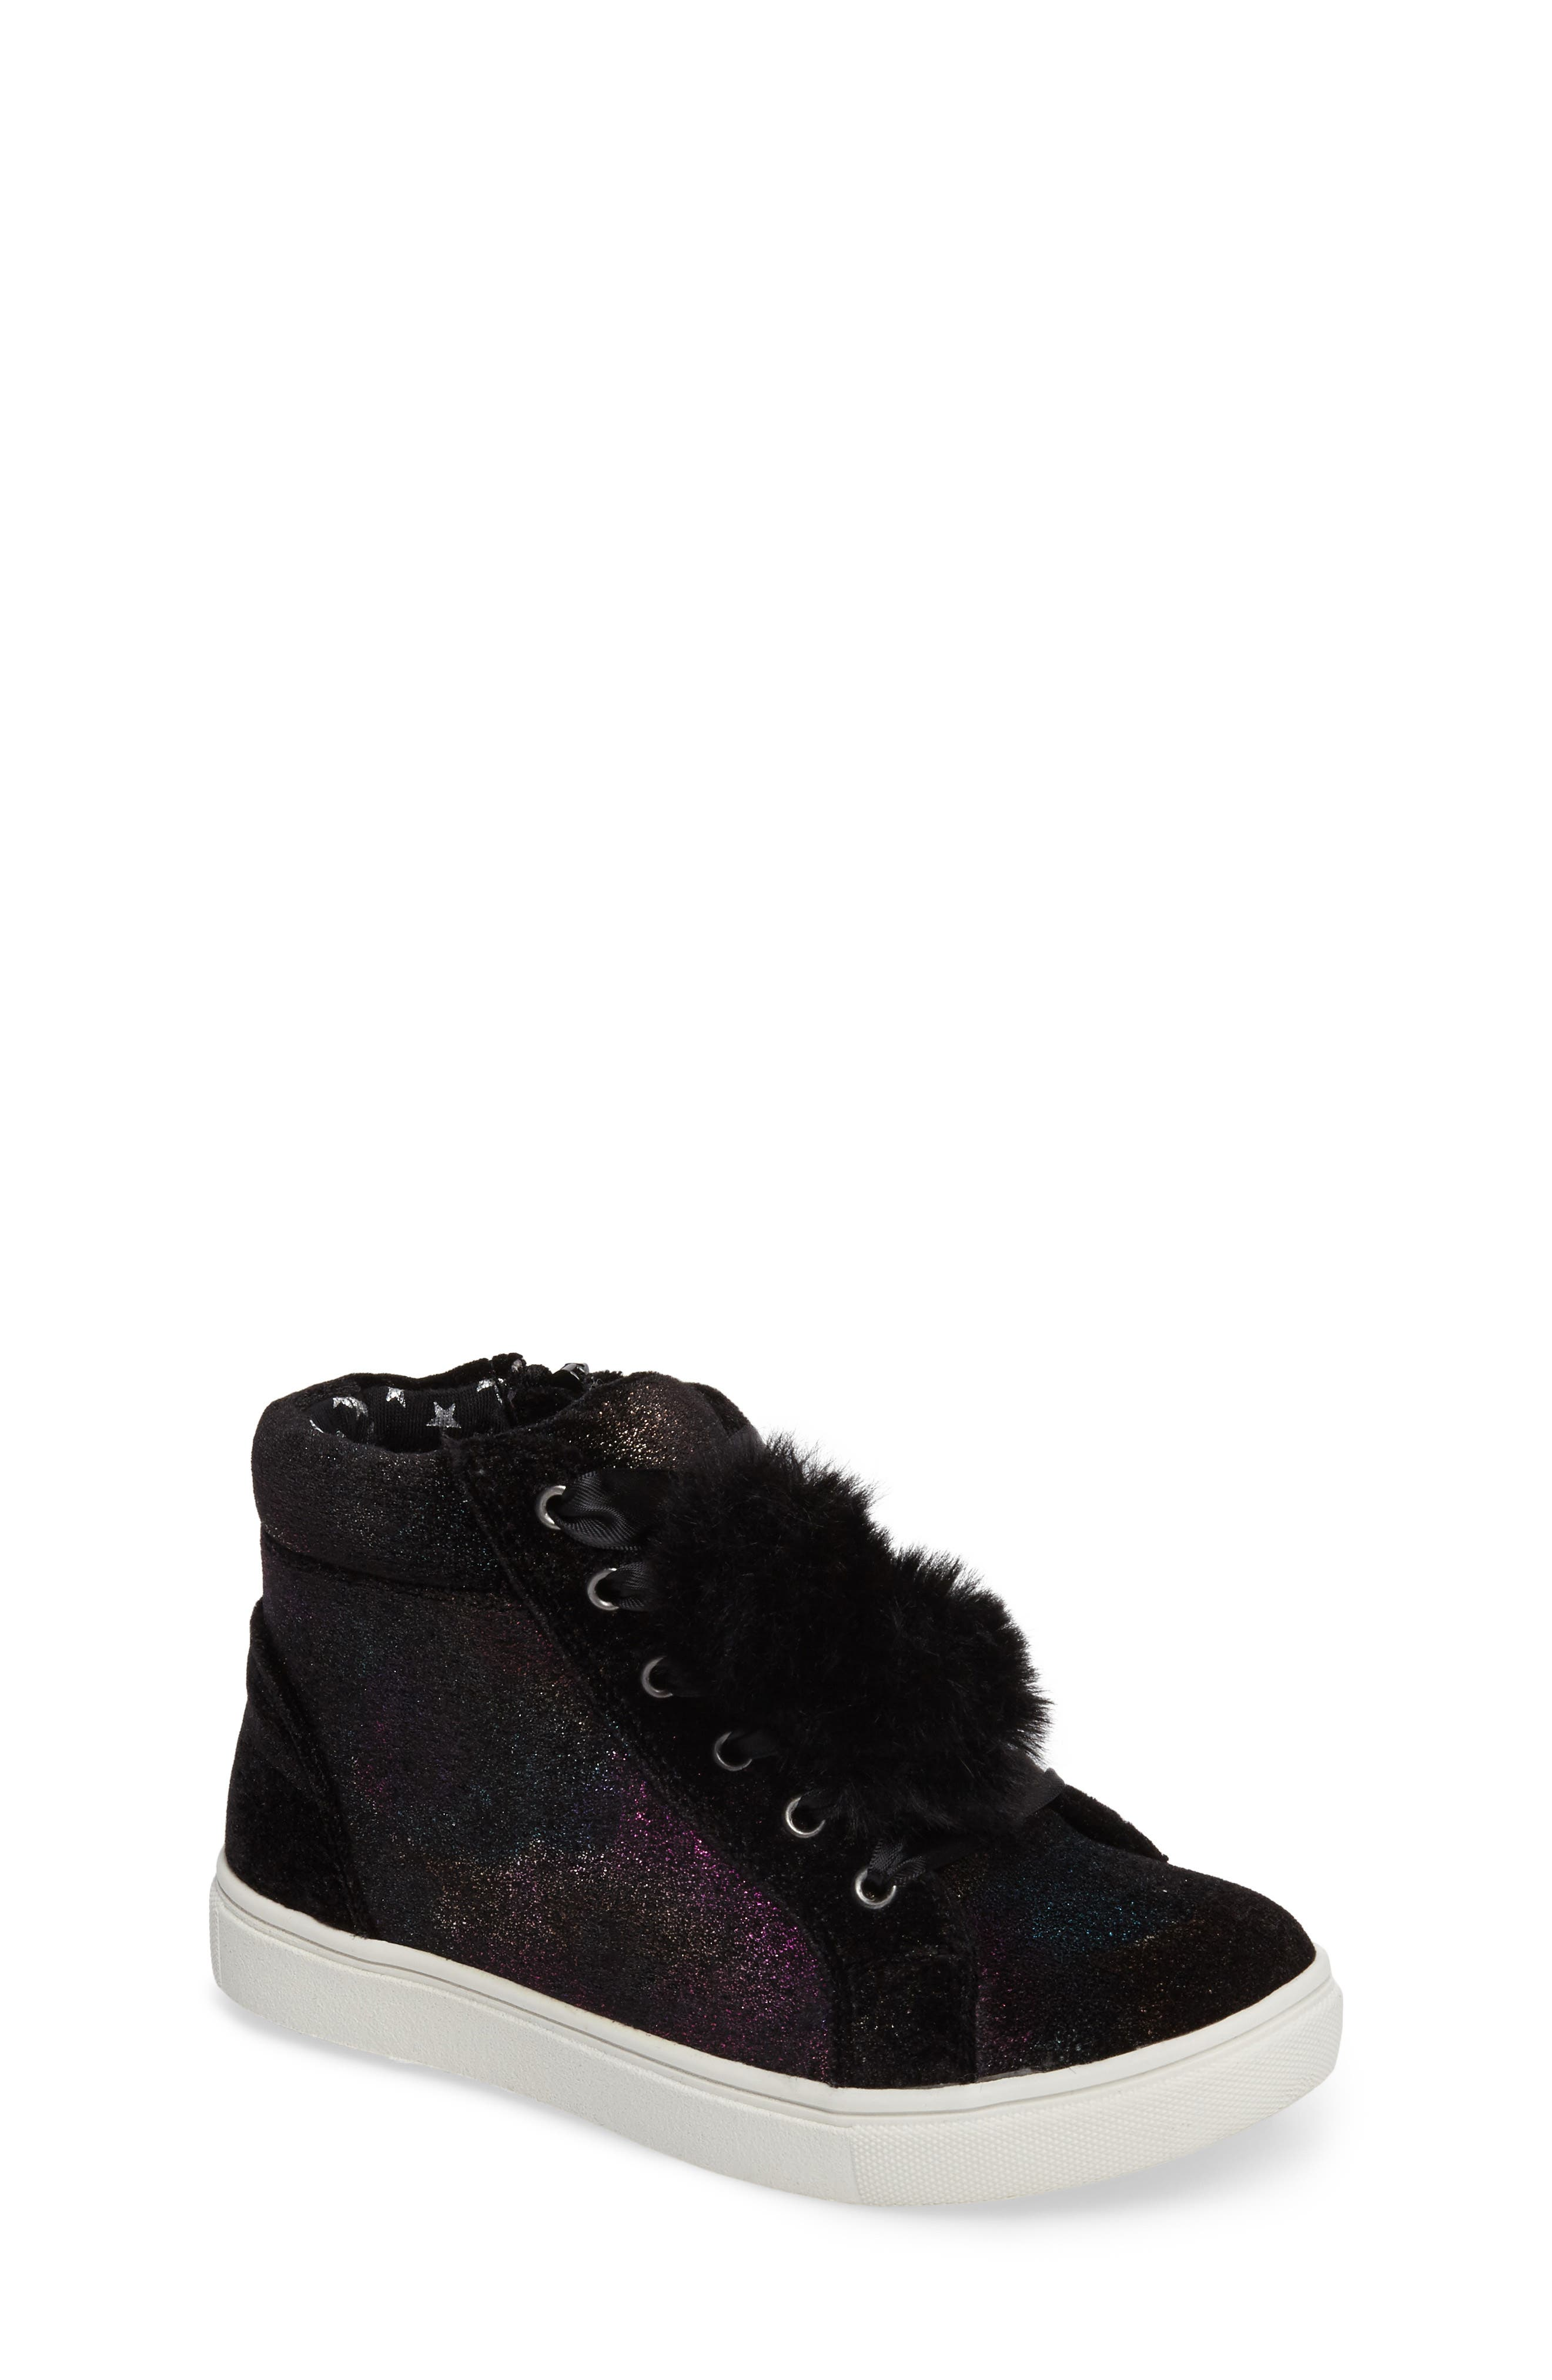 JBrielle High Top Sneaker,                             Main thumbnail 1, color,                             015